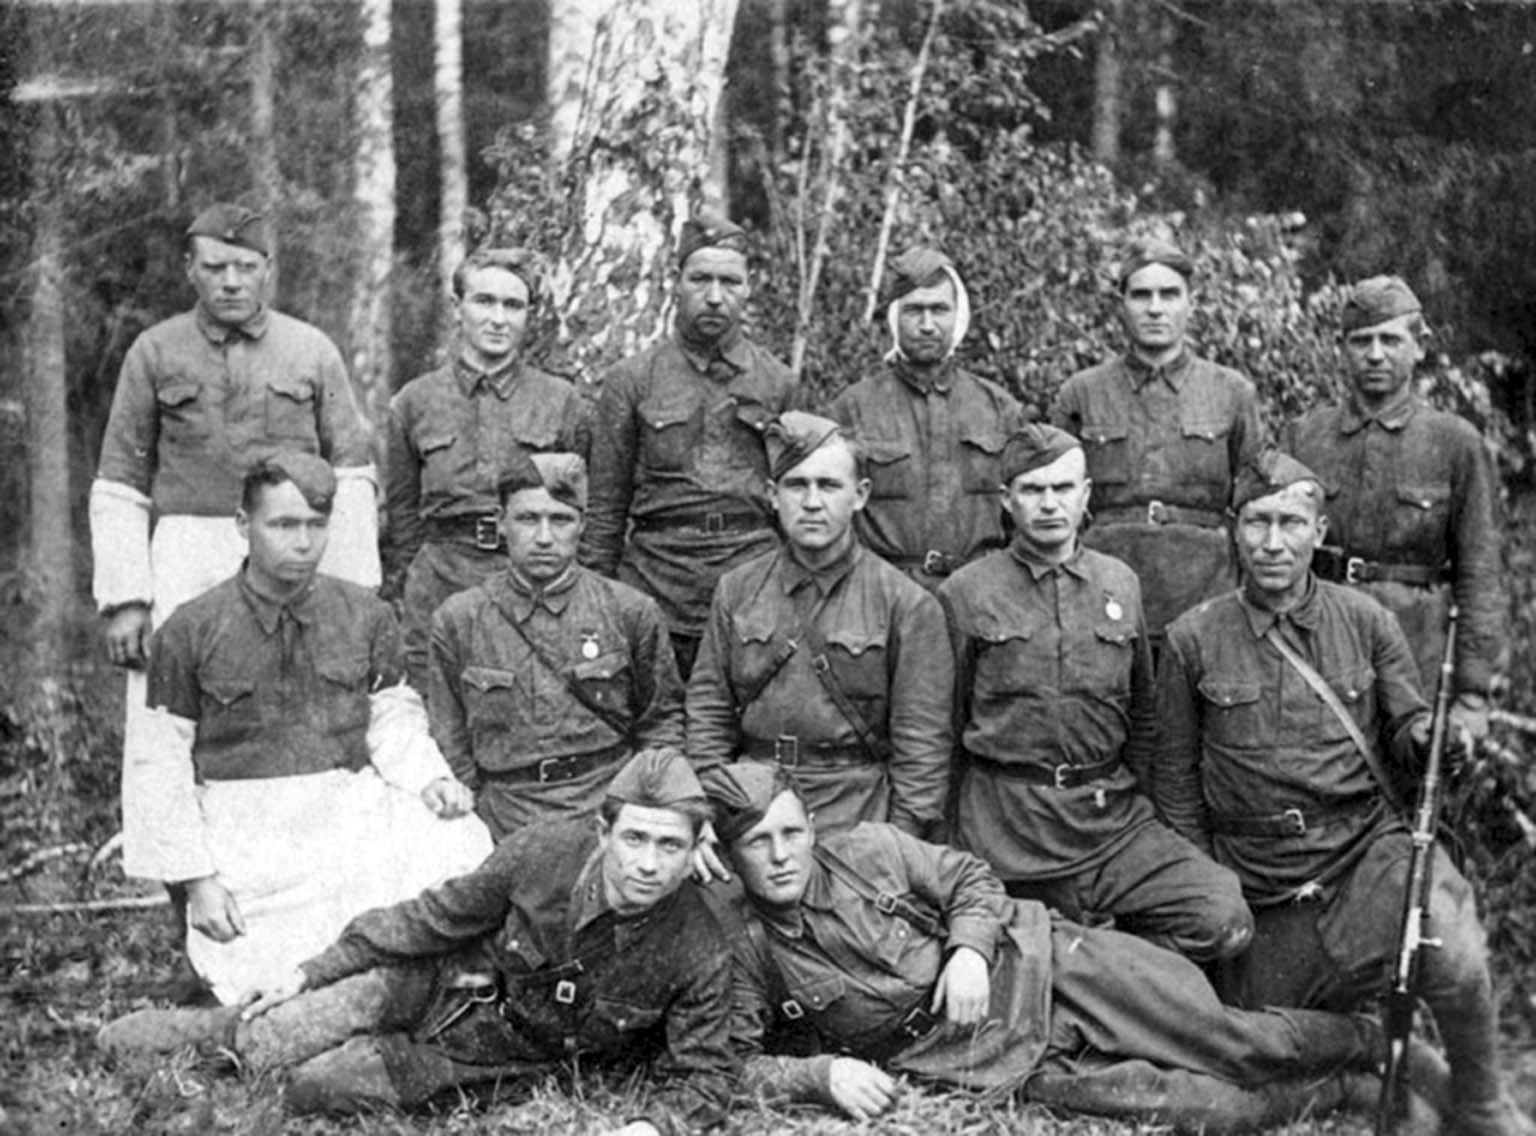 Infantry Division